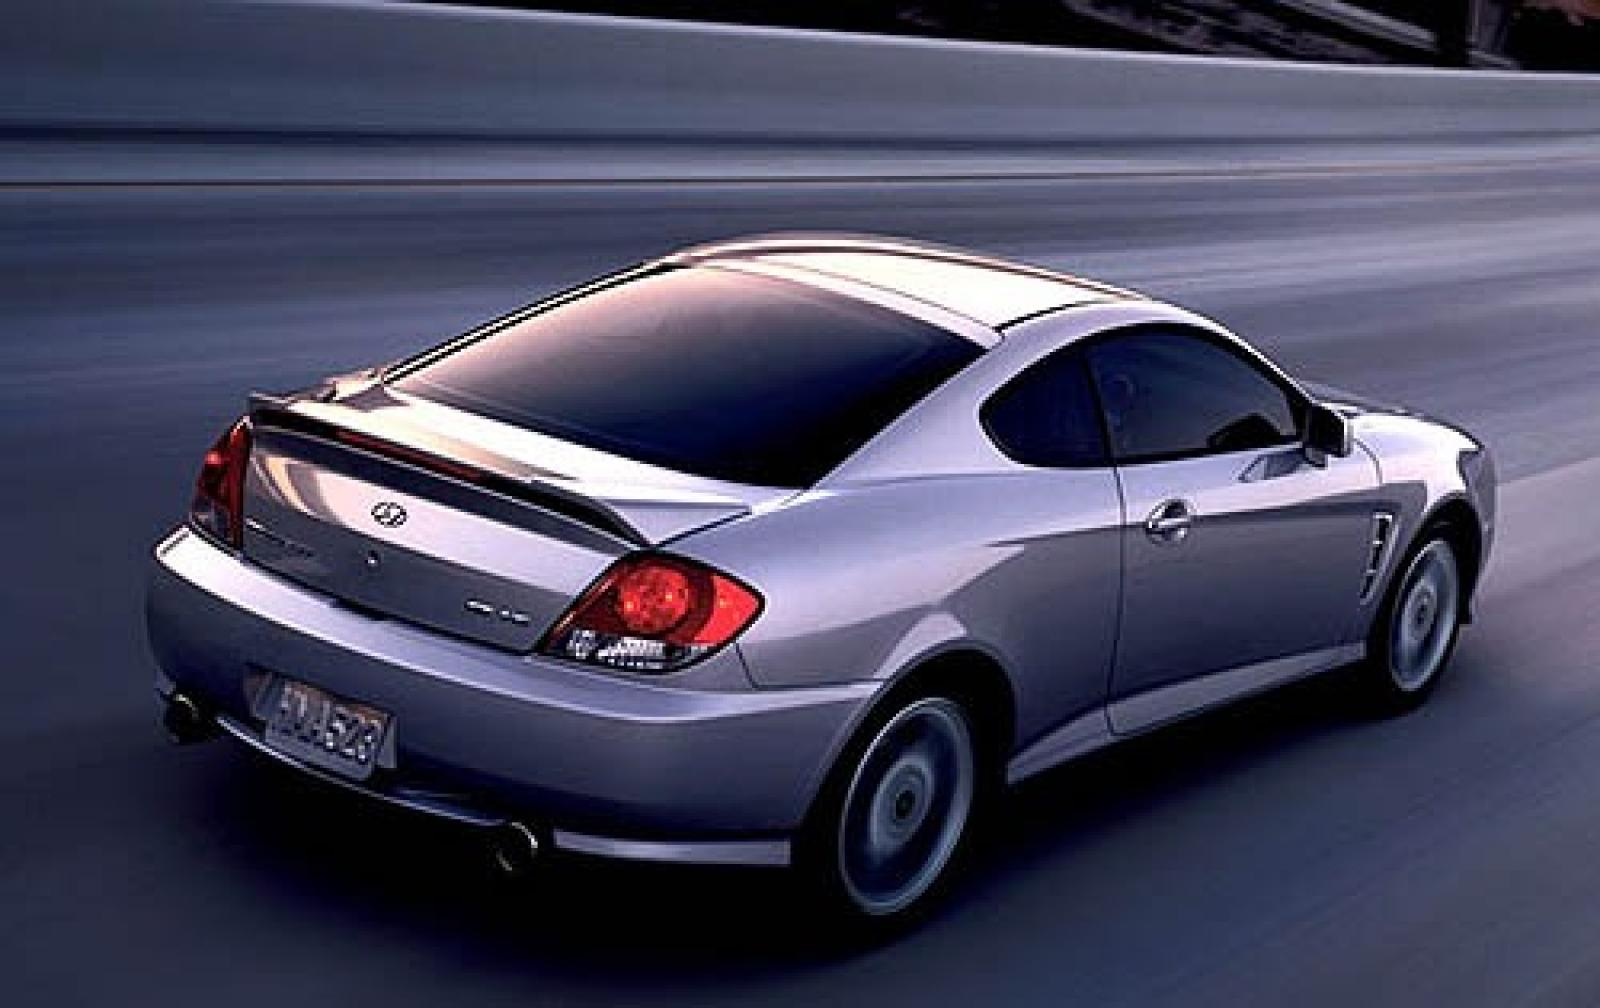 2006 Hyundai Tiburon - Information and photos - ZombieDrive